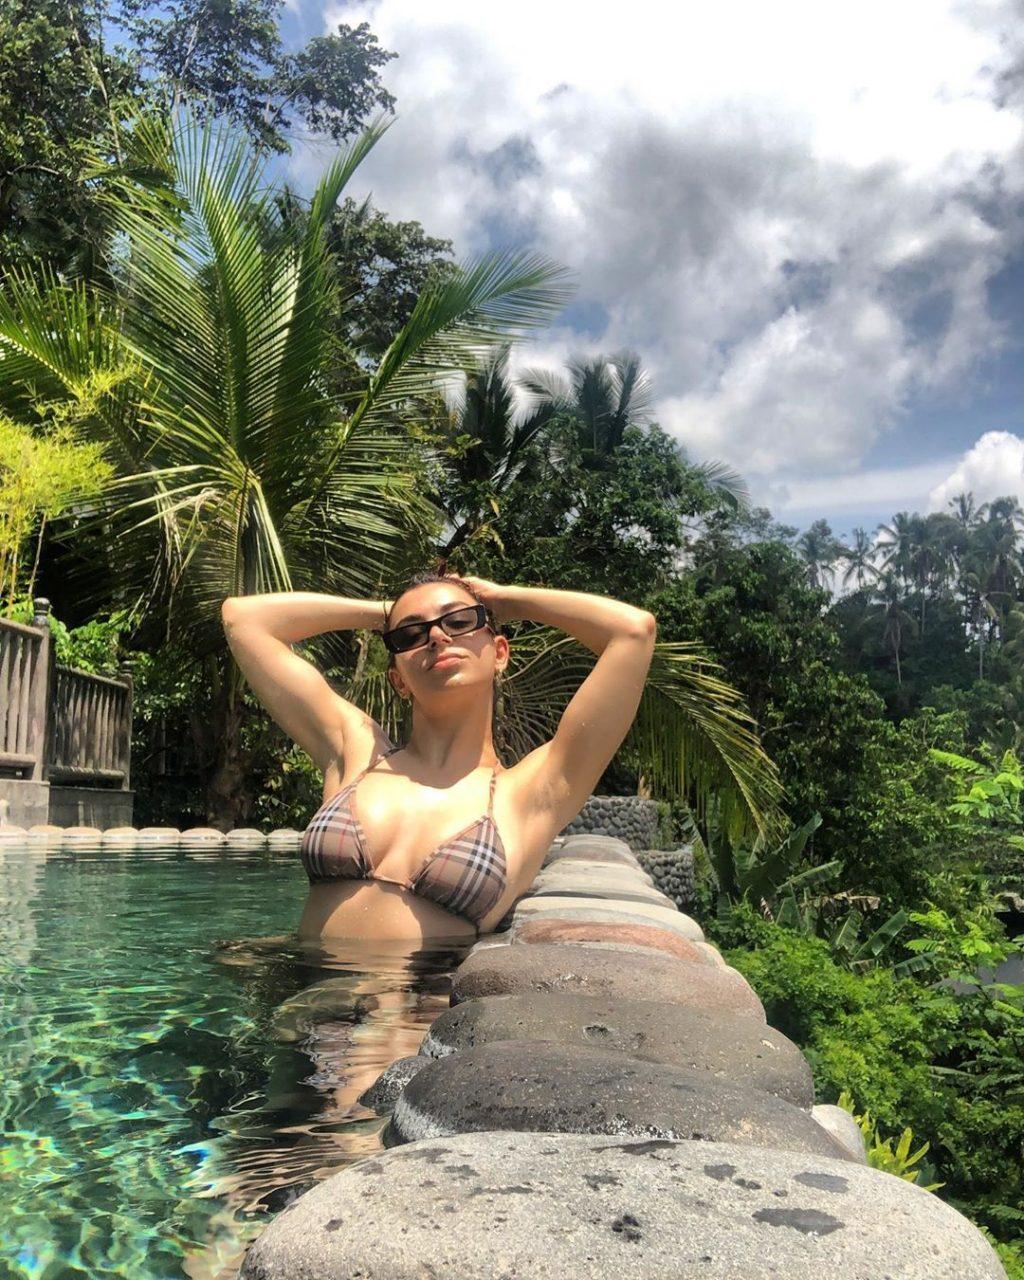 Charli XCX's Tits on Instagram (12 Pics + GIFs)